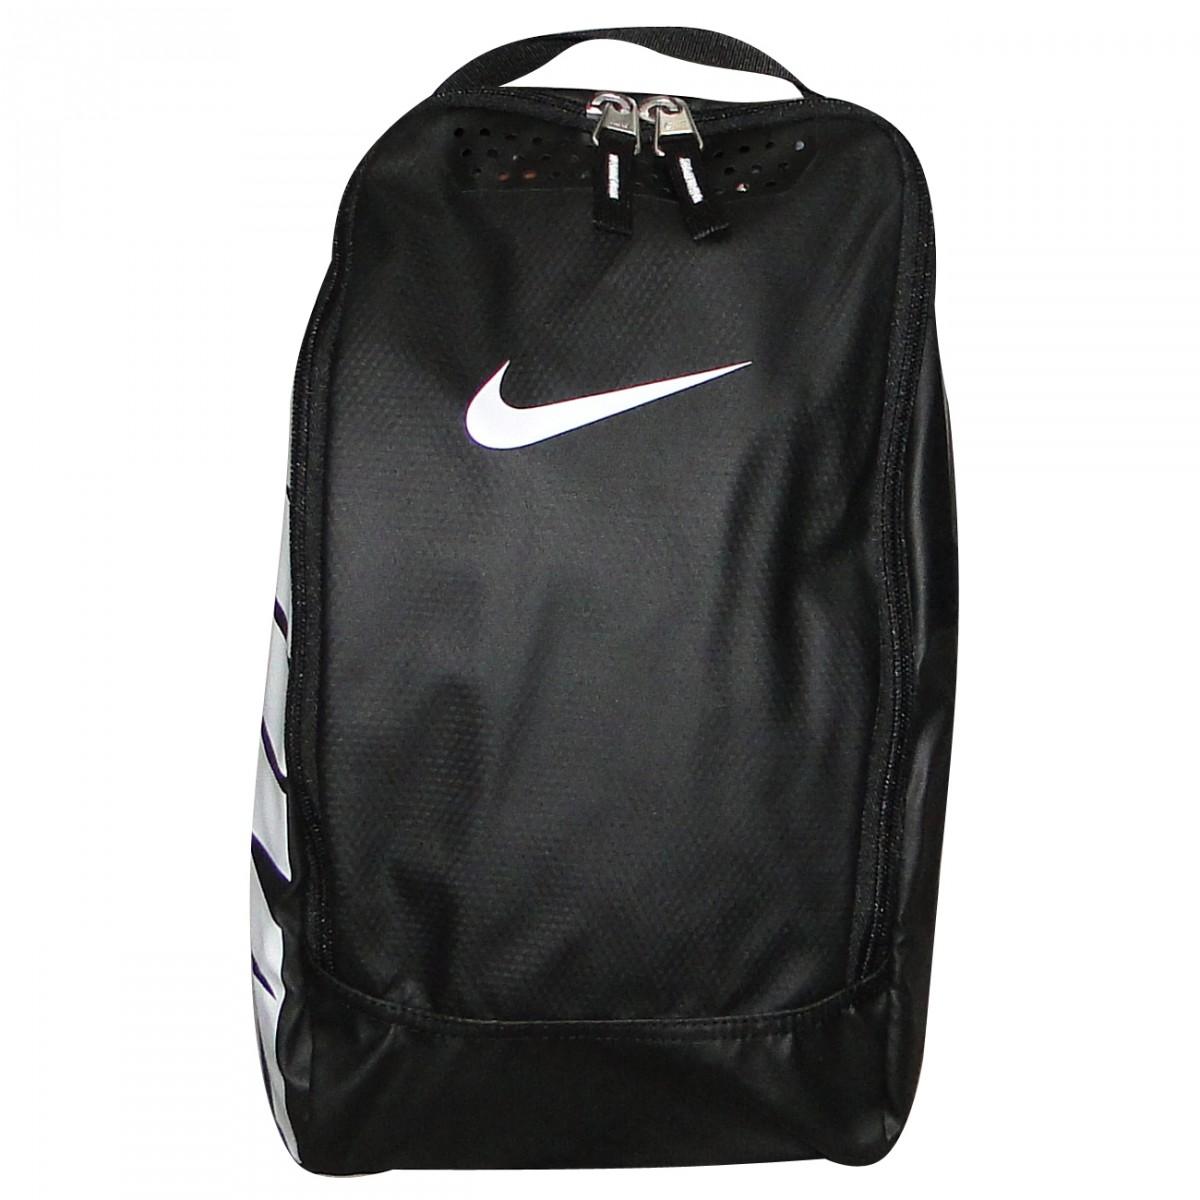 820d6689a8c6b Porta Chuteira Nike Ref.Ba4600 BA4600-067 - Preto/Branco - Chuteira Nike,  Adidas. Sandalias Femininas. Sandy Calçados